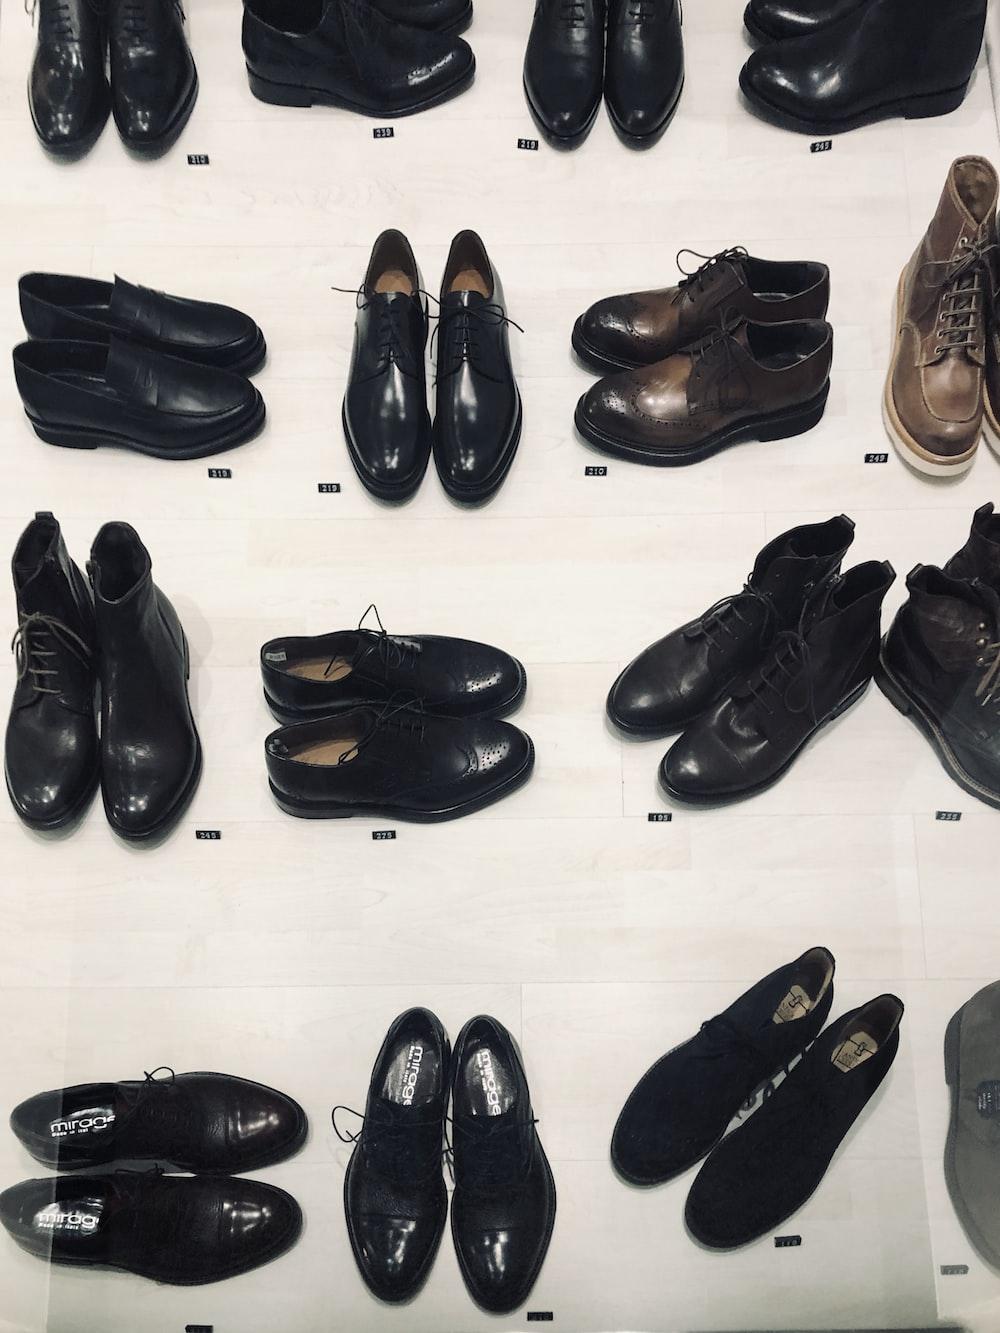 black leather dress shoes on white floor tiles